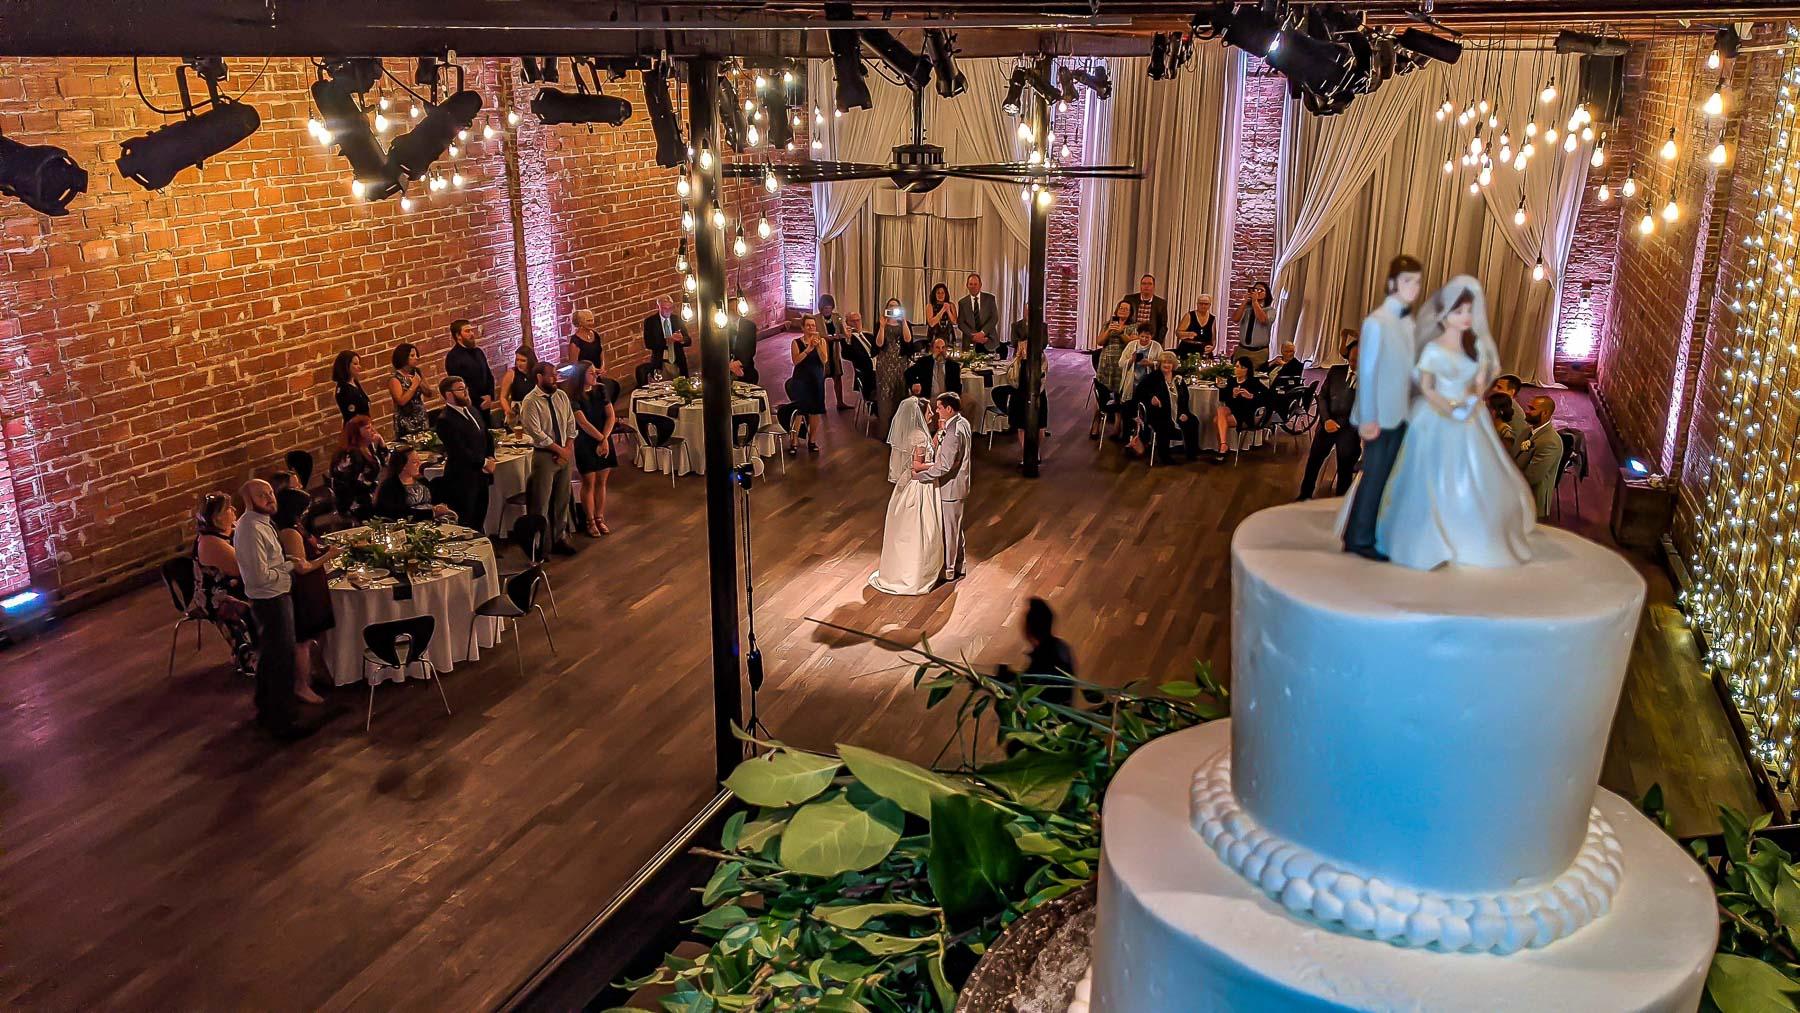 2020 03-01 Spring Green Courtyard wedding at St. Pete venue NOVA 535